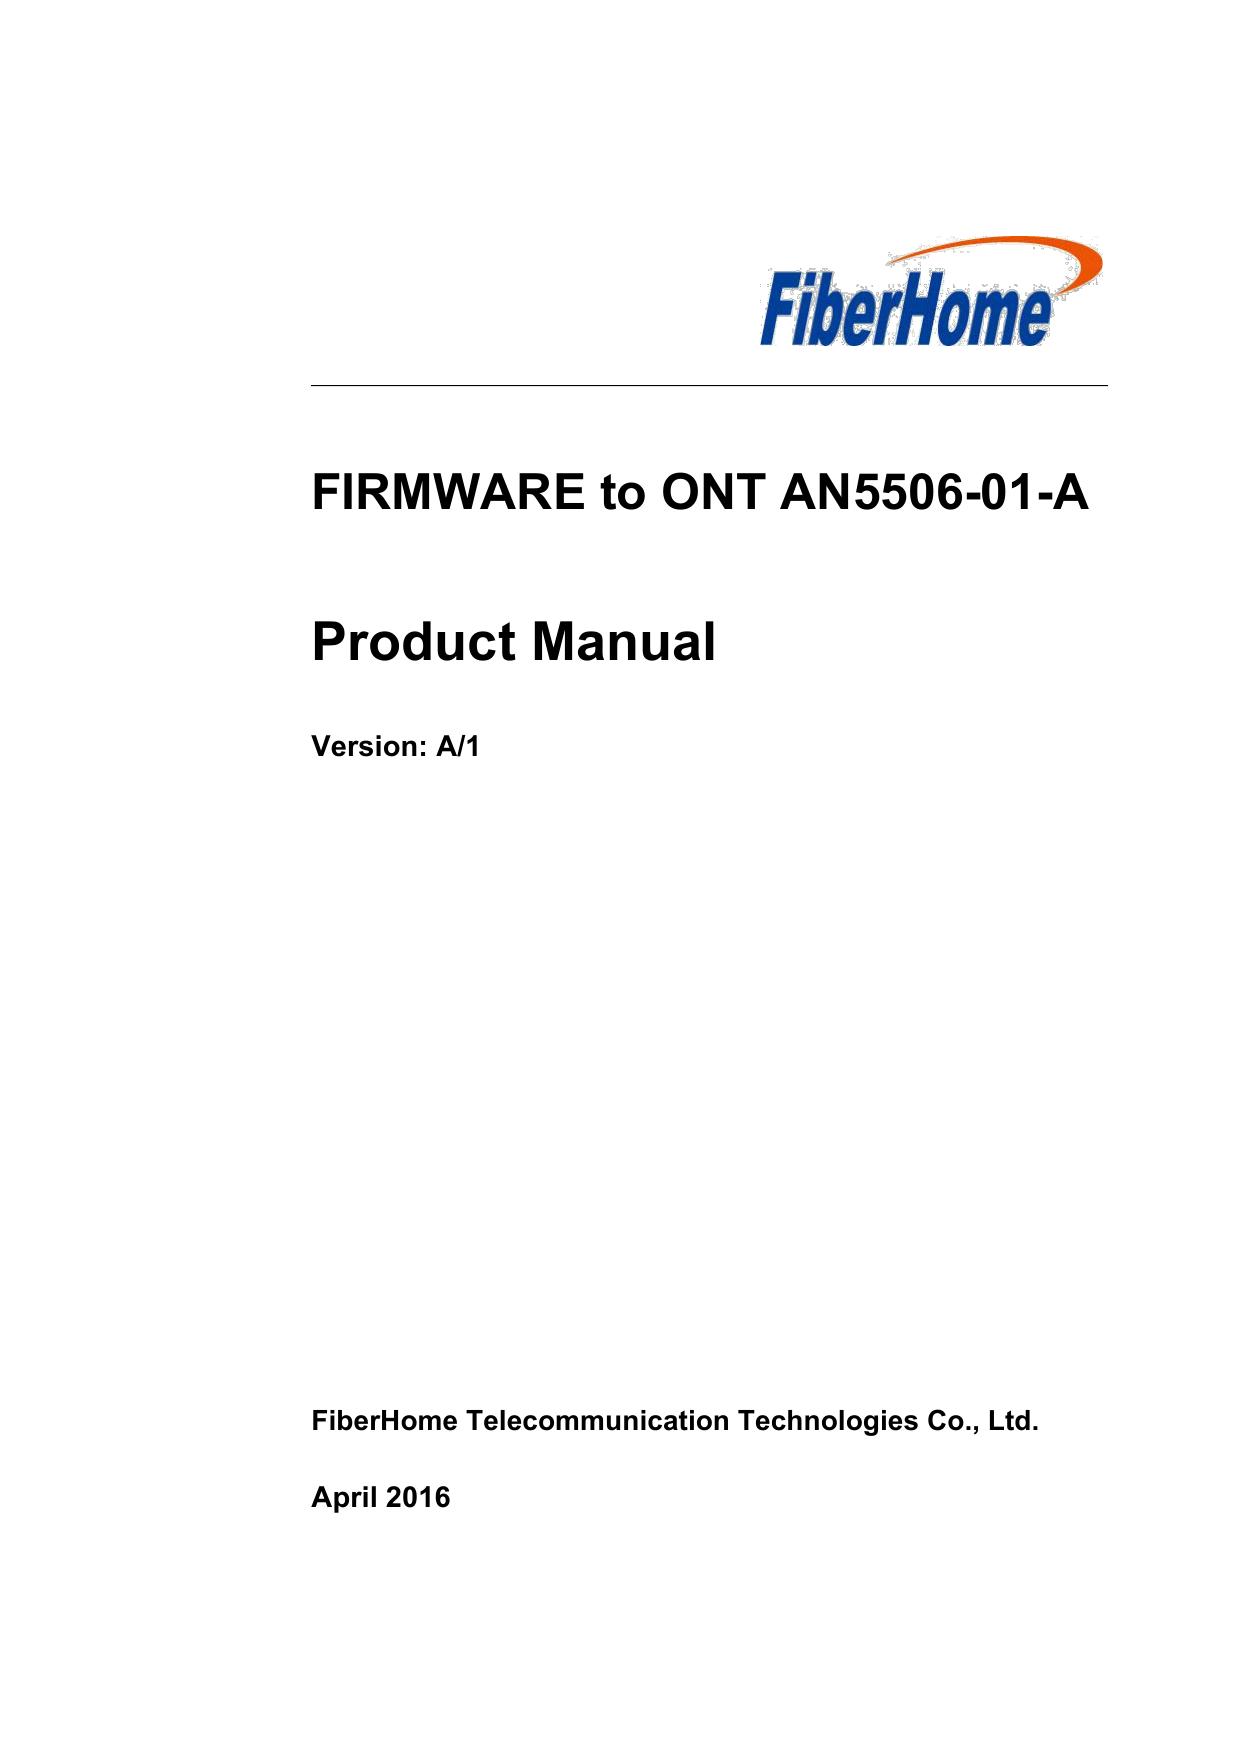 FIRMWARE AN5506-01-A Manual | manualzz com